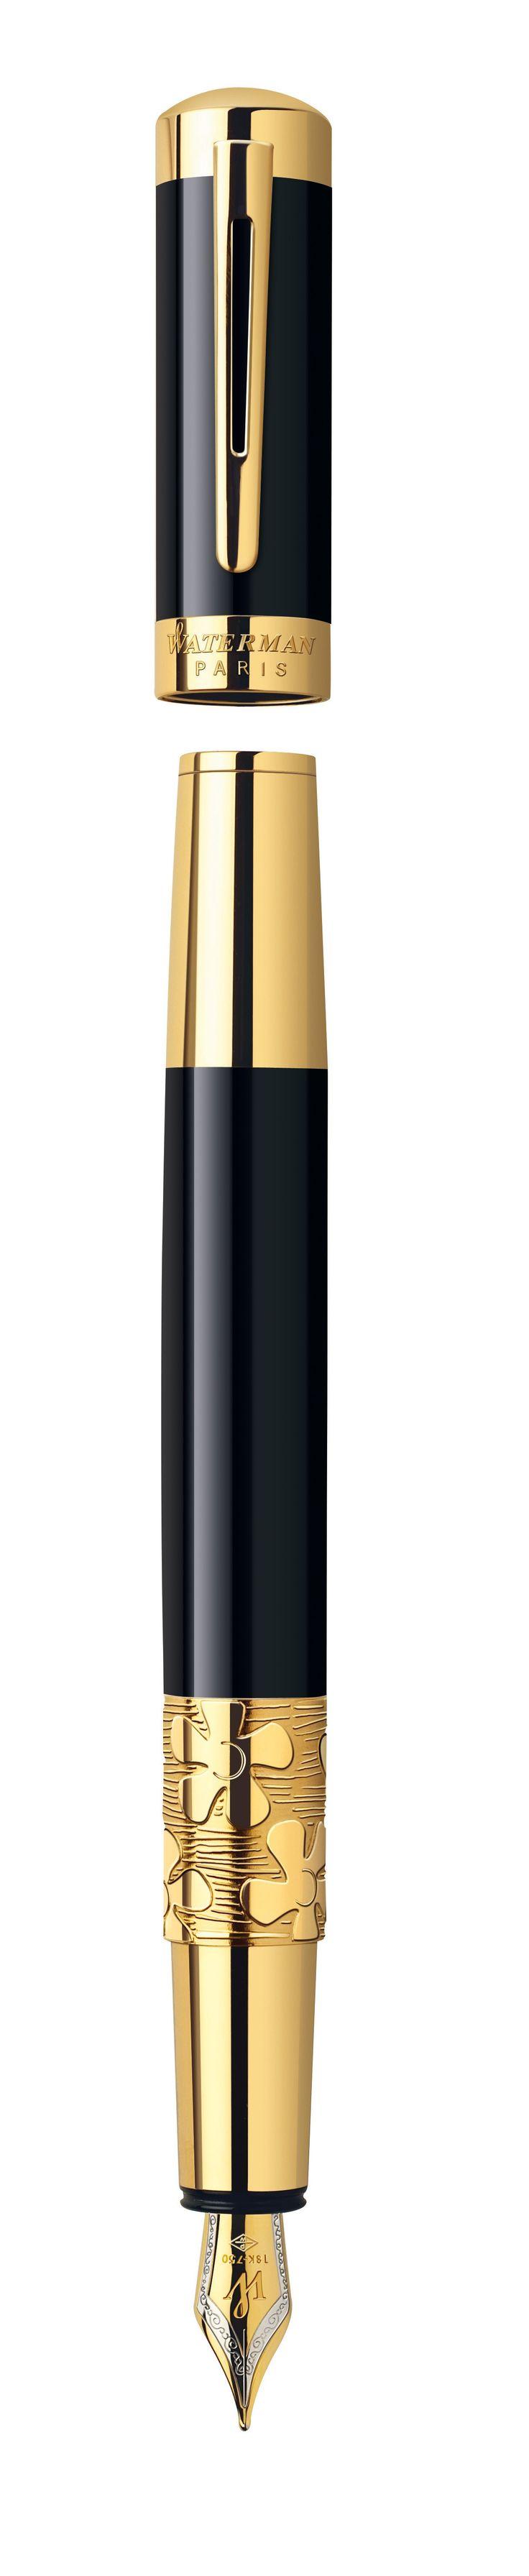 Stylo plume Waterman Élégance Noir GT | Syll Le leader européen du Stylos de Luxe